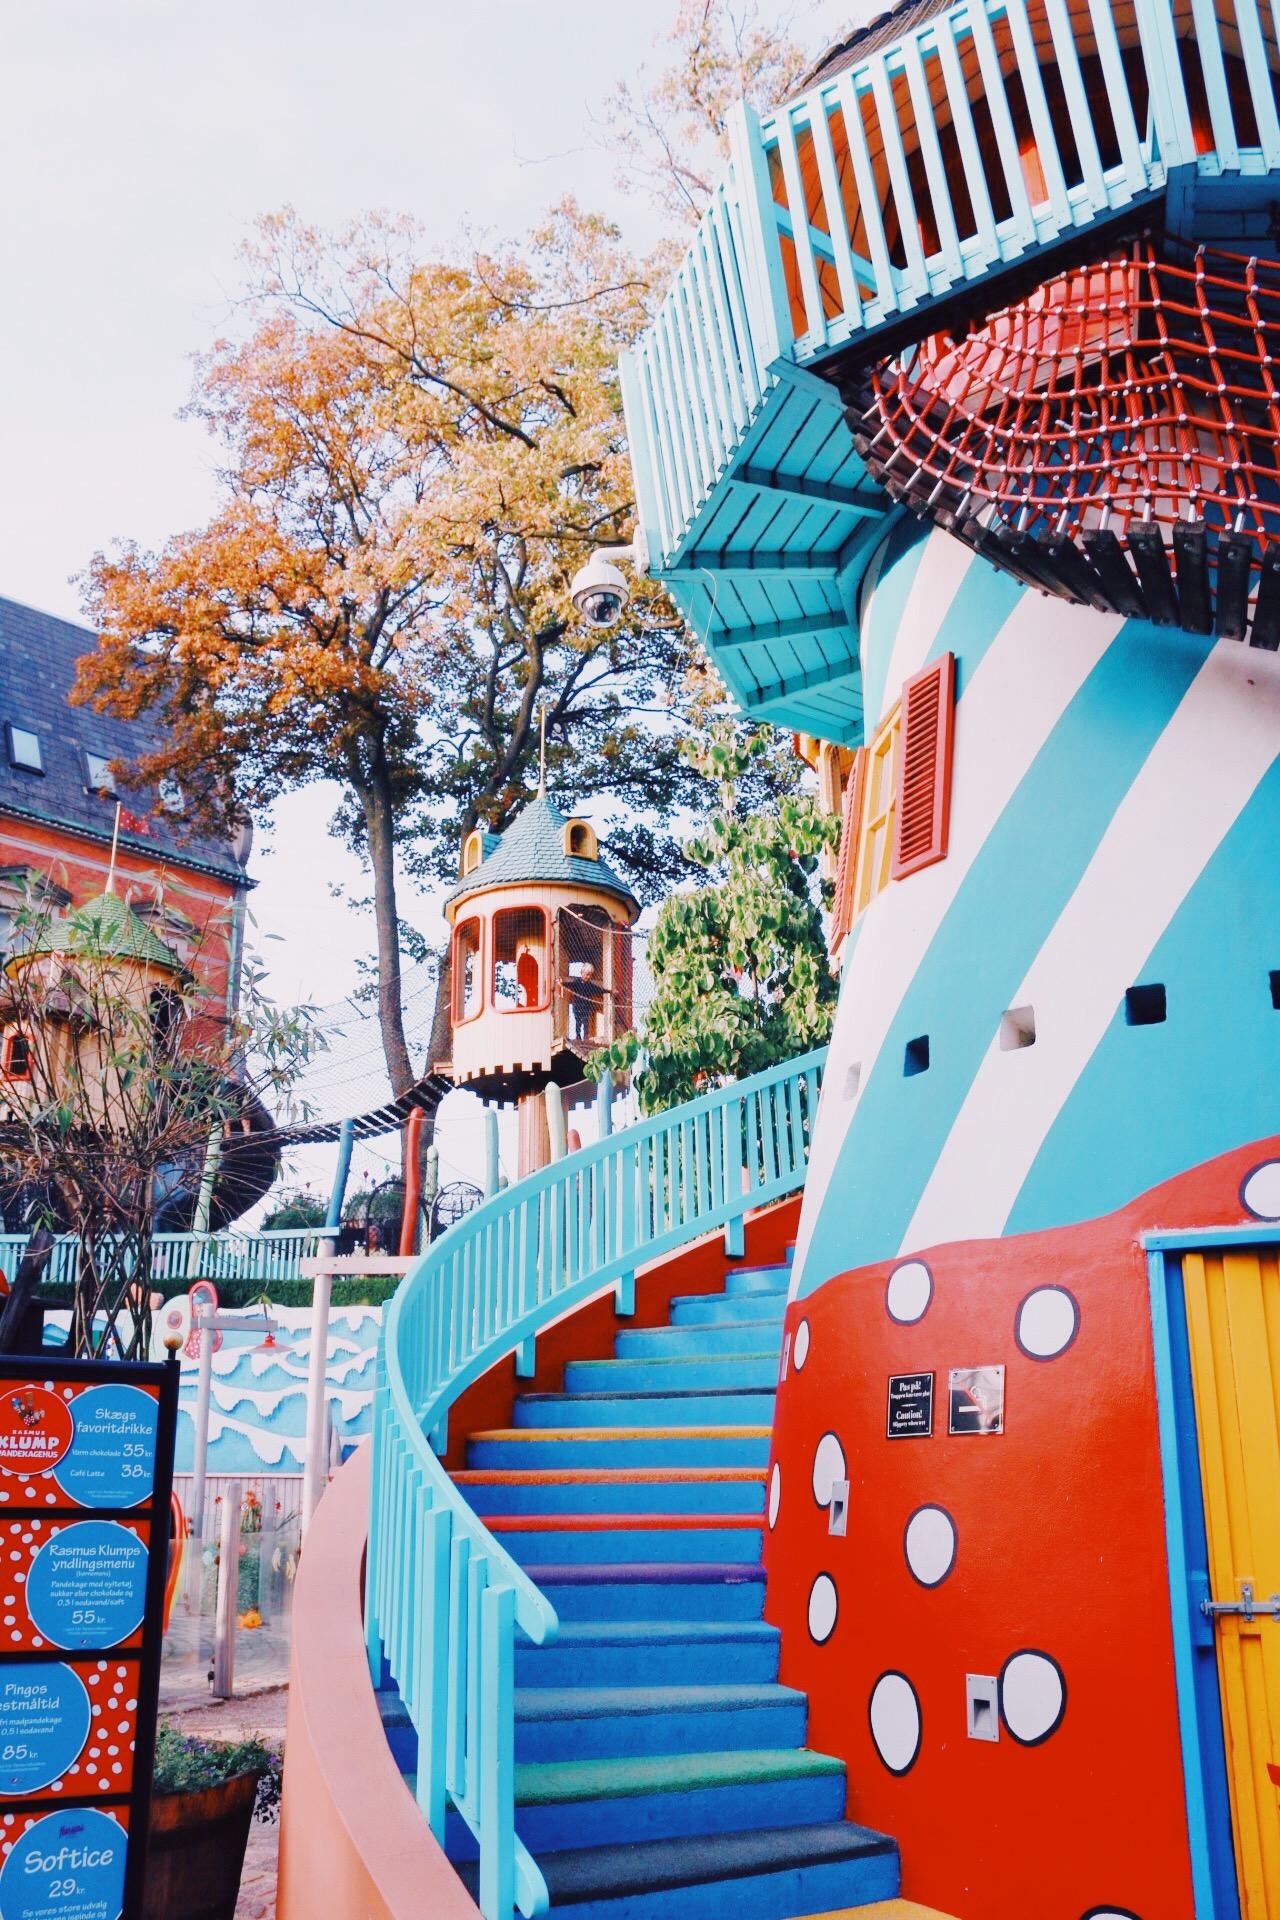 Tivoli Gardens Review - Copenhagen, Denmark   travelhappy luxury travel agency